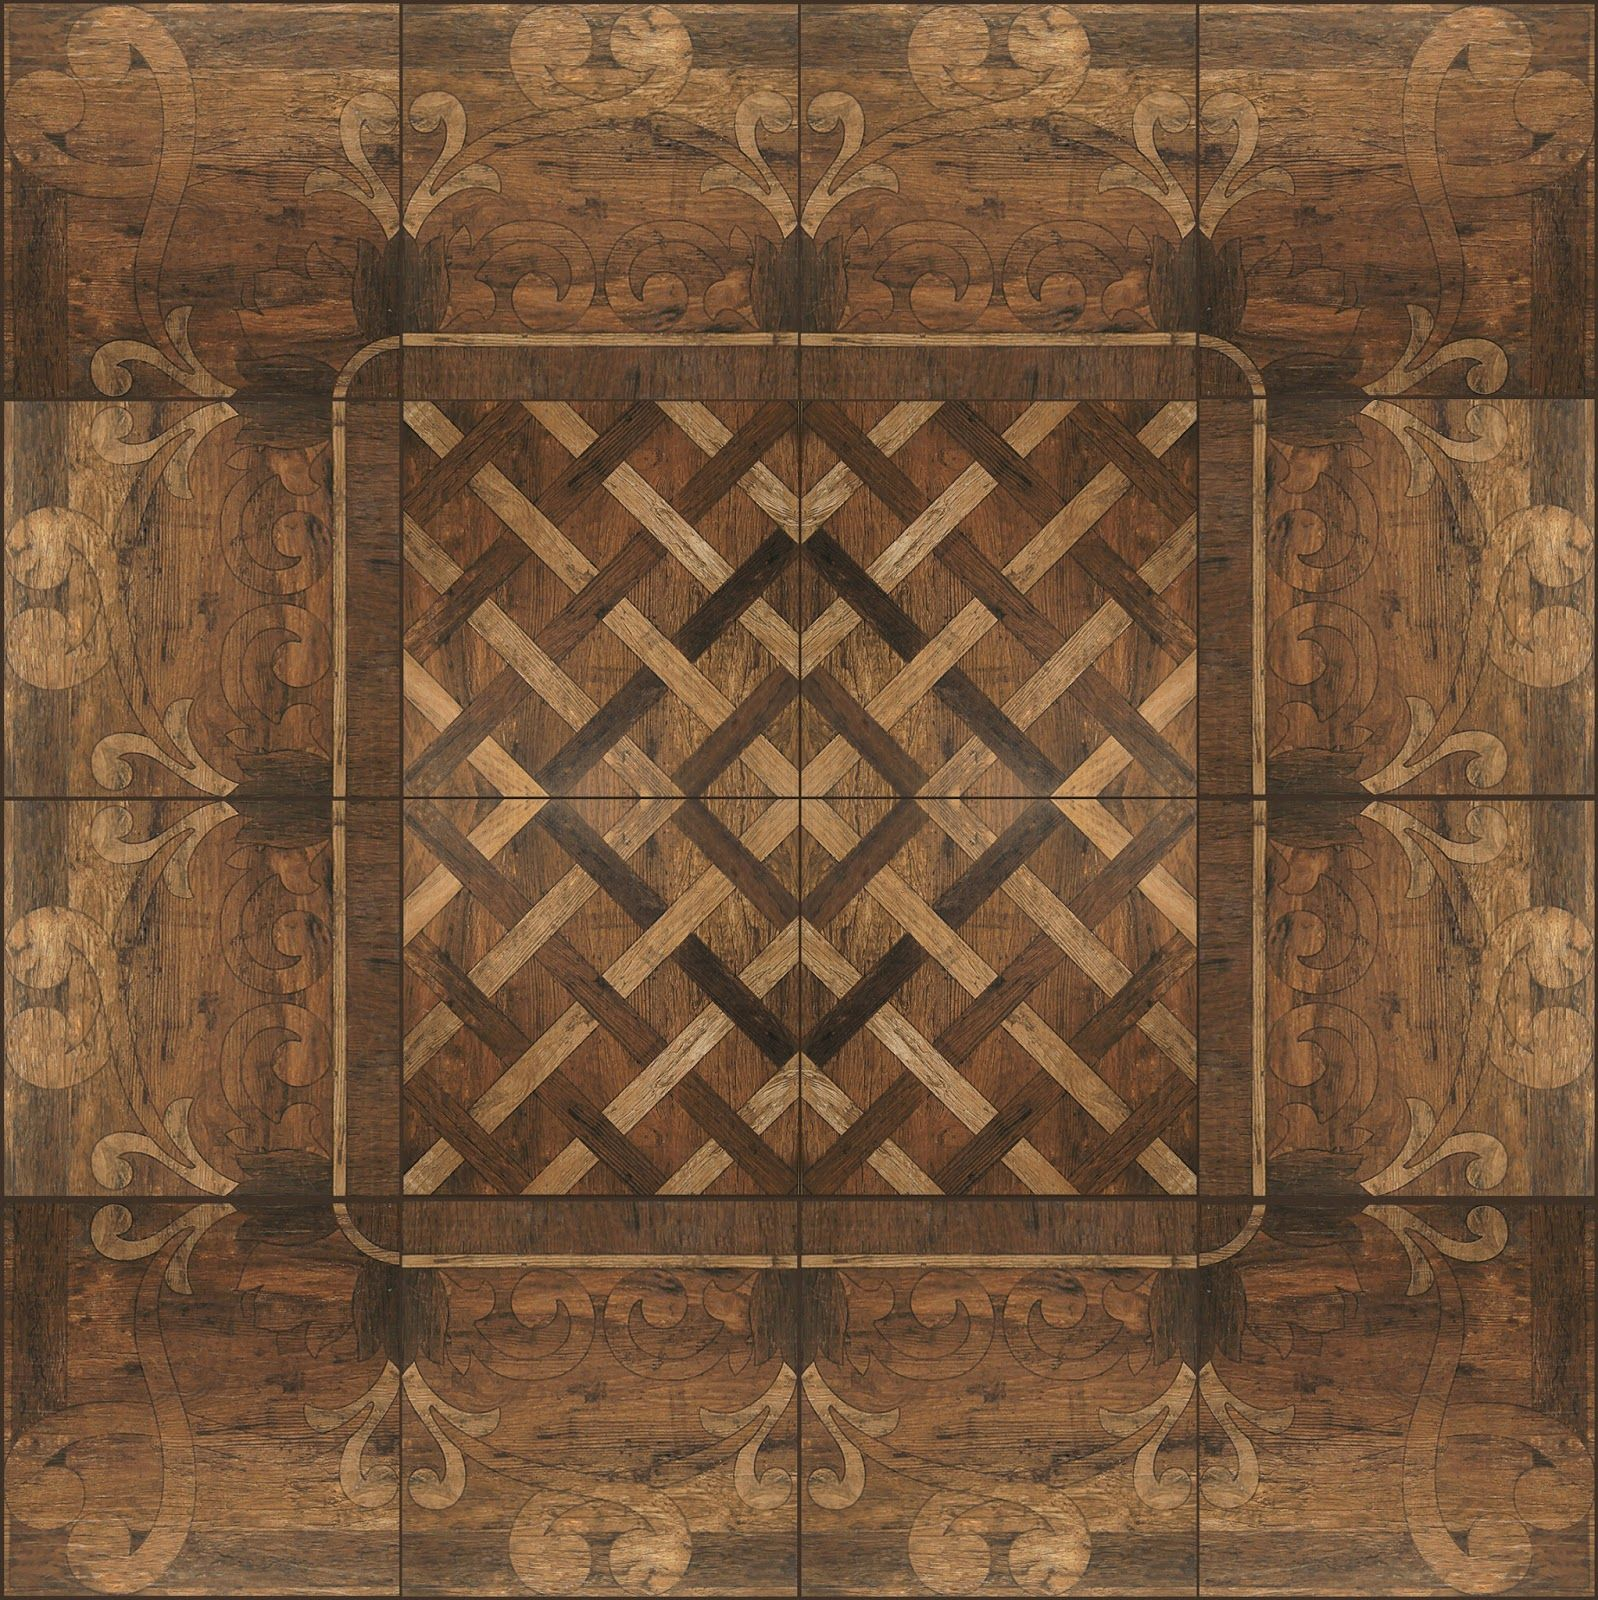 UPDATE NEW WOOD CERAMIC FLOOR TILES Ceramic floor tiles